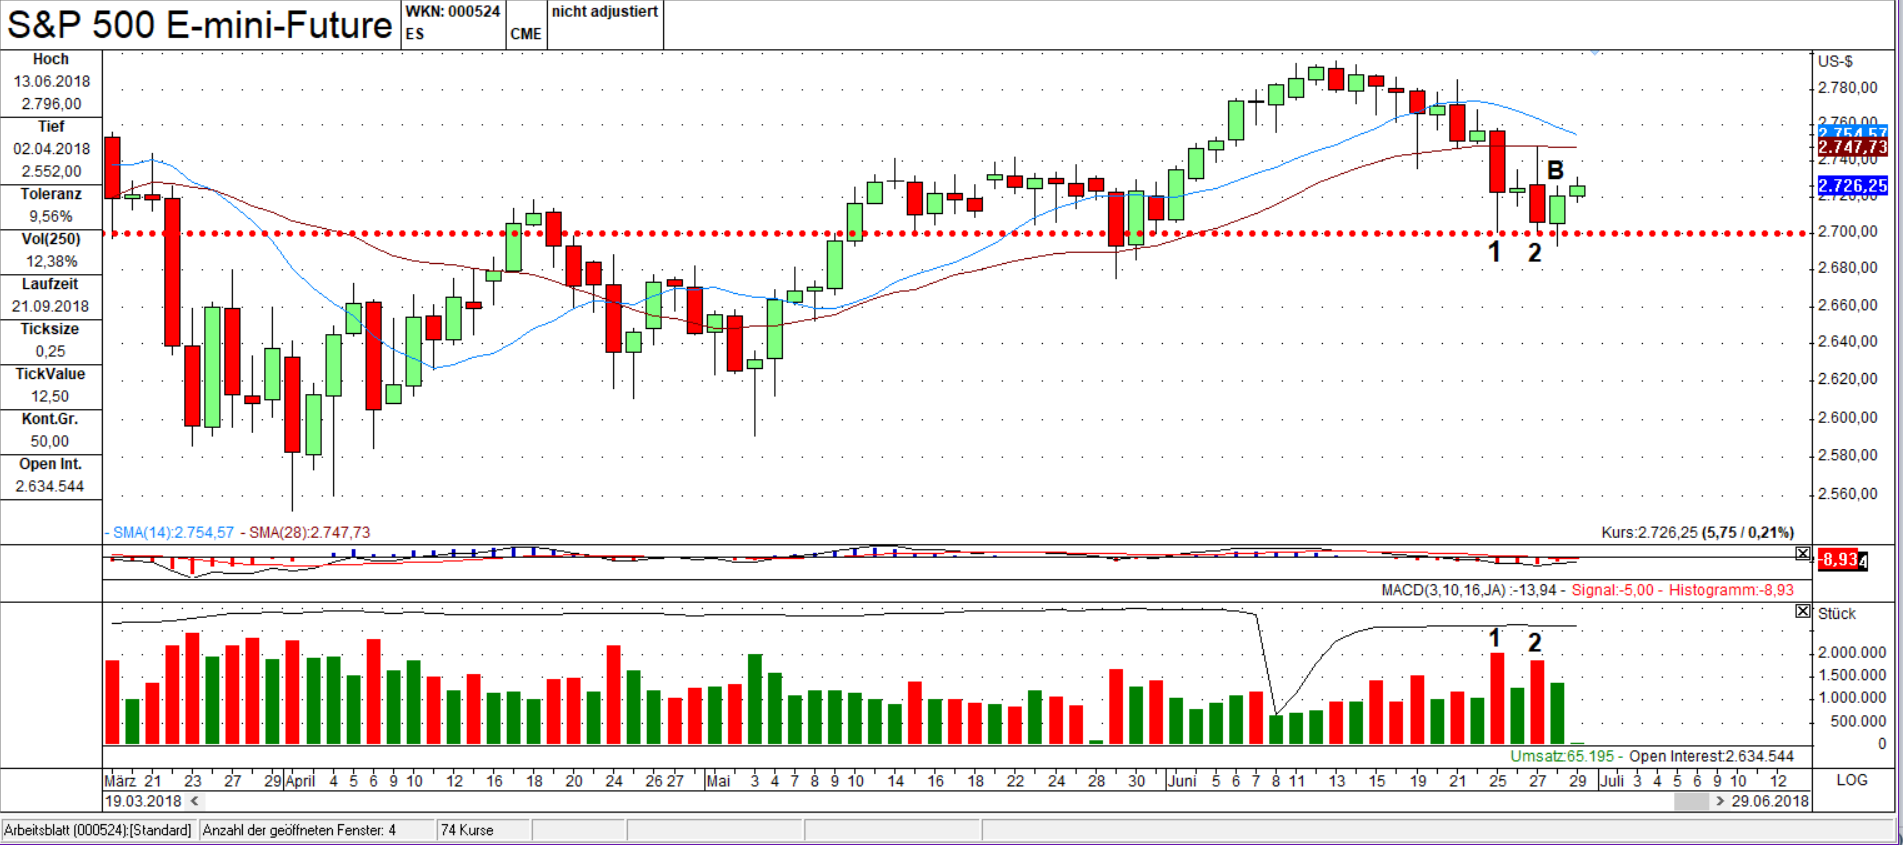 ES Candlestick Chart: Footprints 1&2 + Umkehrstab B